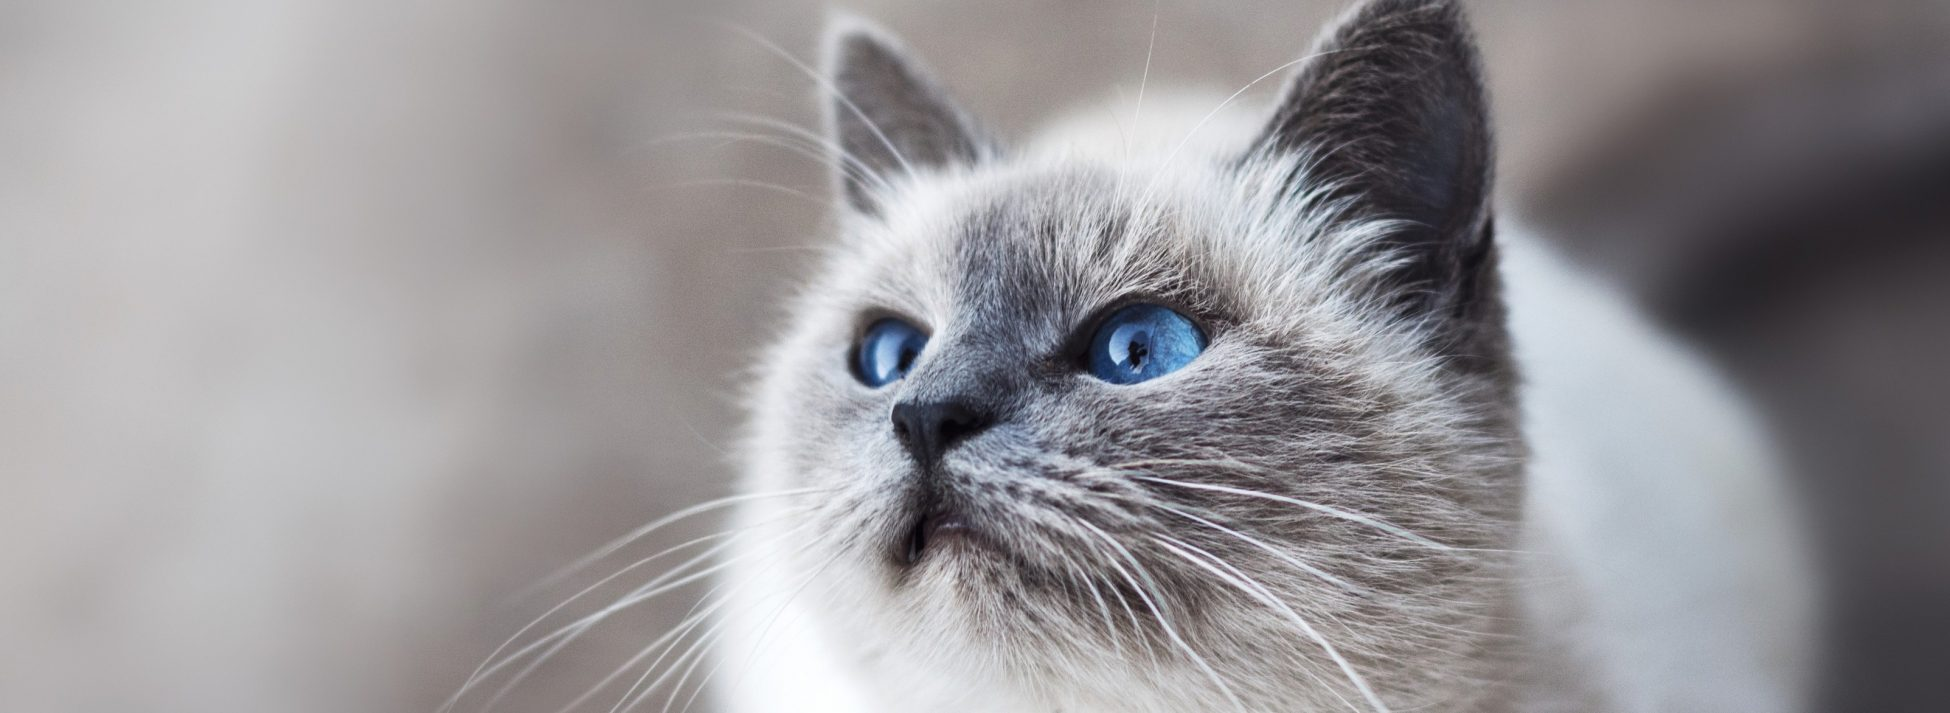 Cleeve Cats Cattery near Melksham